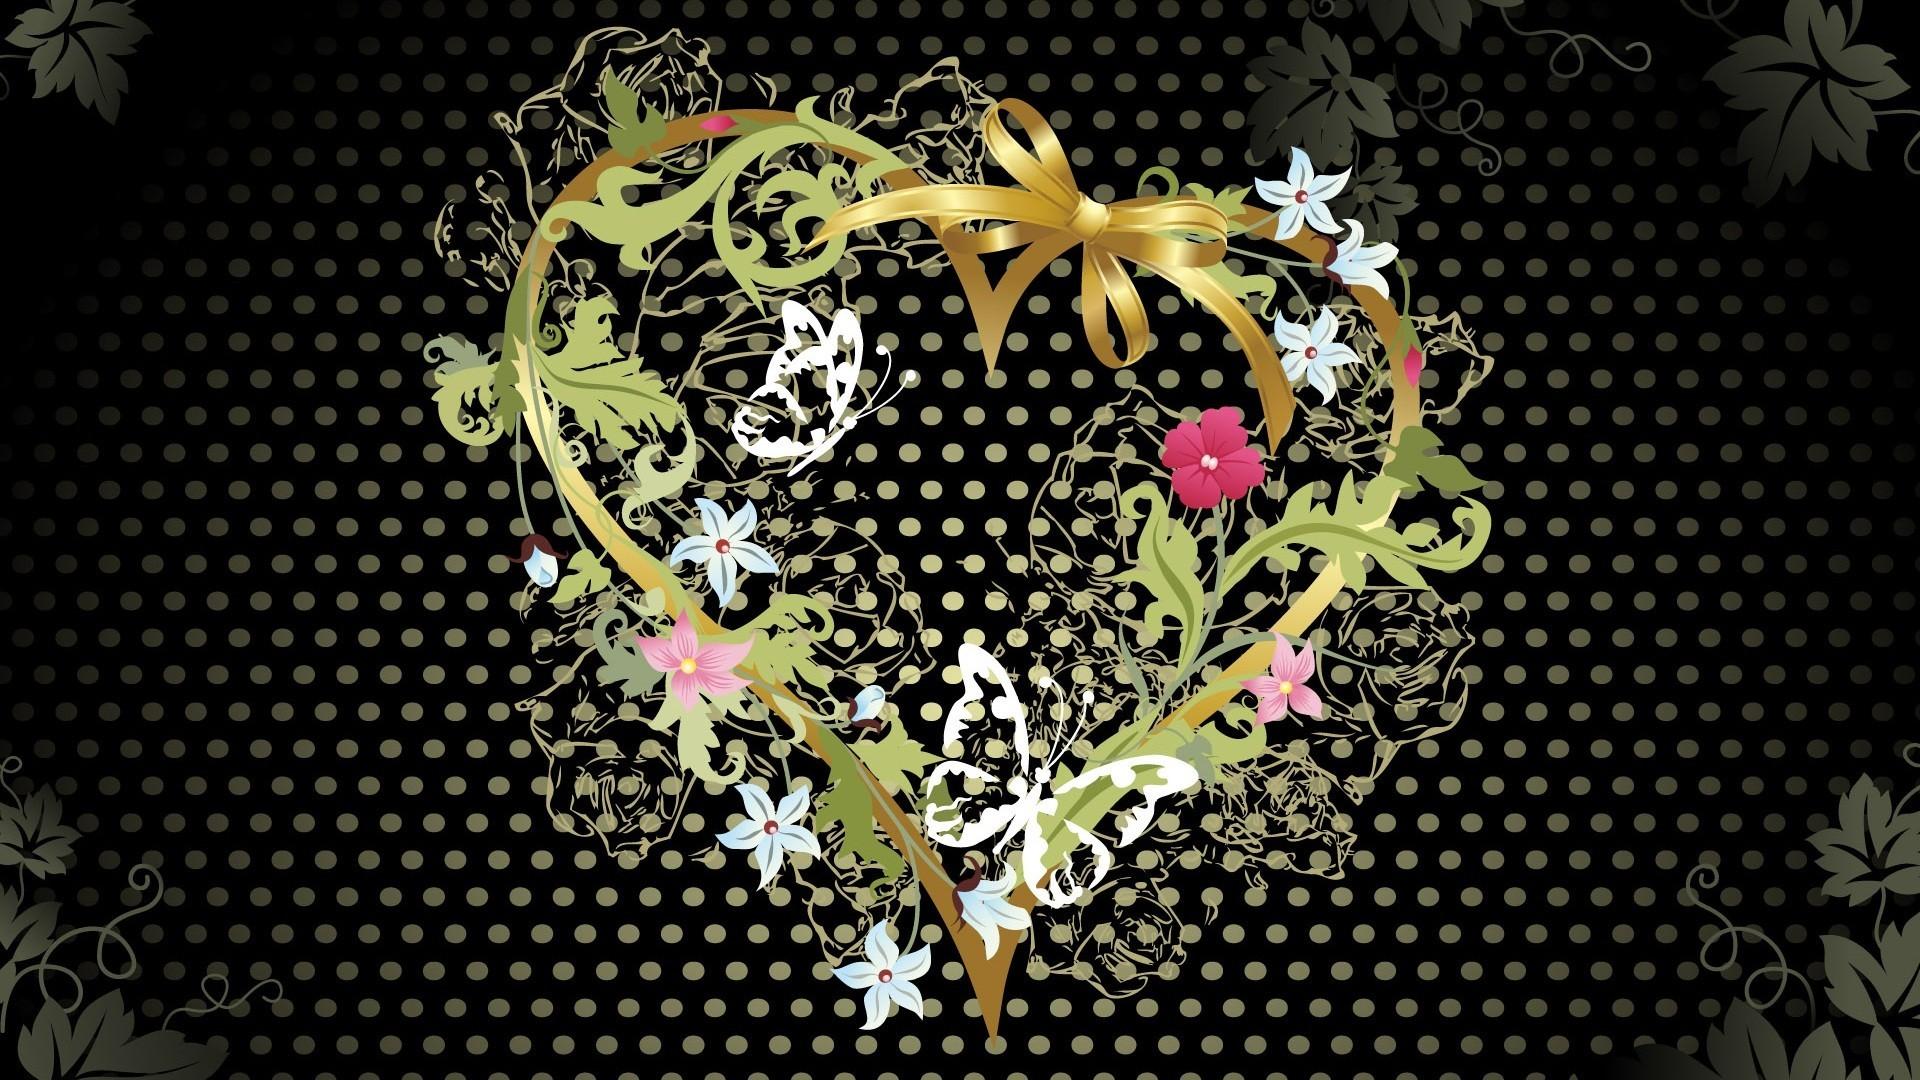 Res: 1920x1080, Love Heart Vector Hd Wallpaper